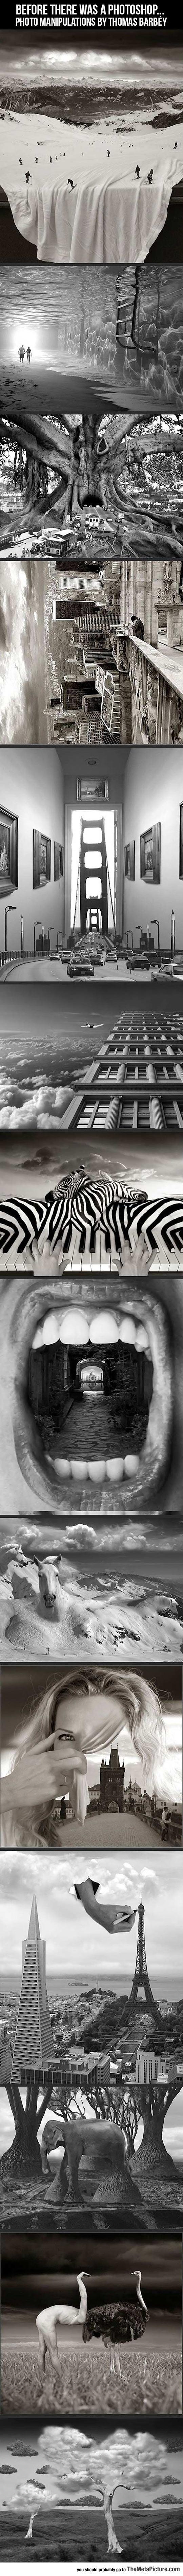 cool-photo-manipulations-Thomas-Barbey-photoshop